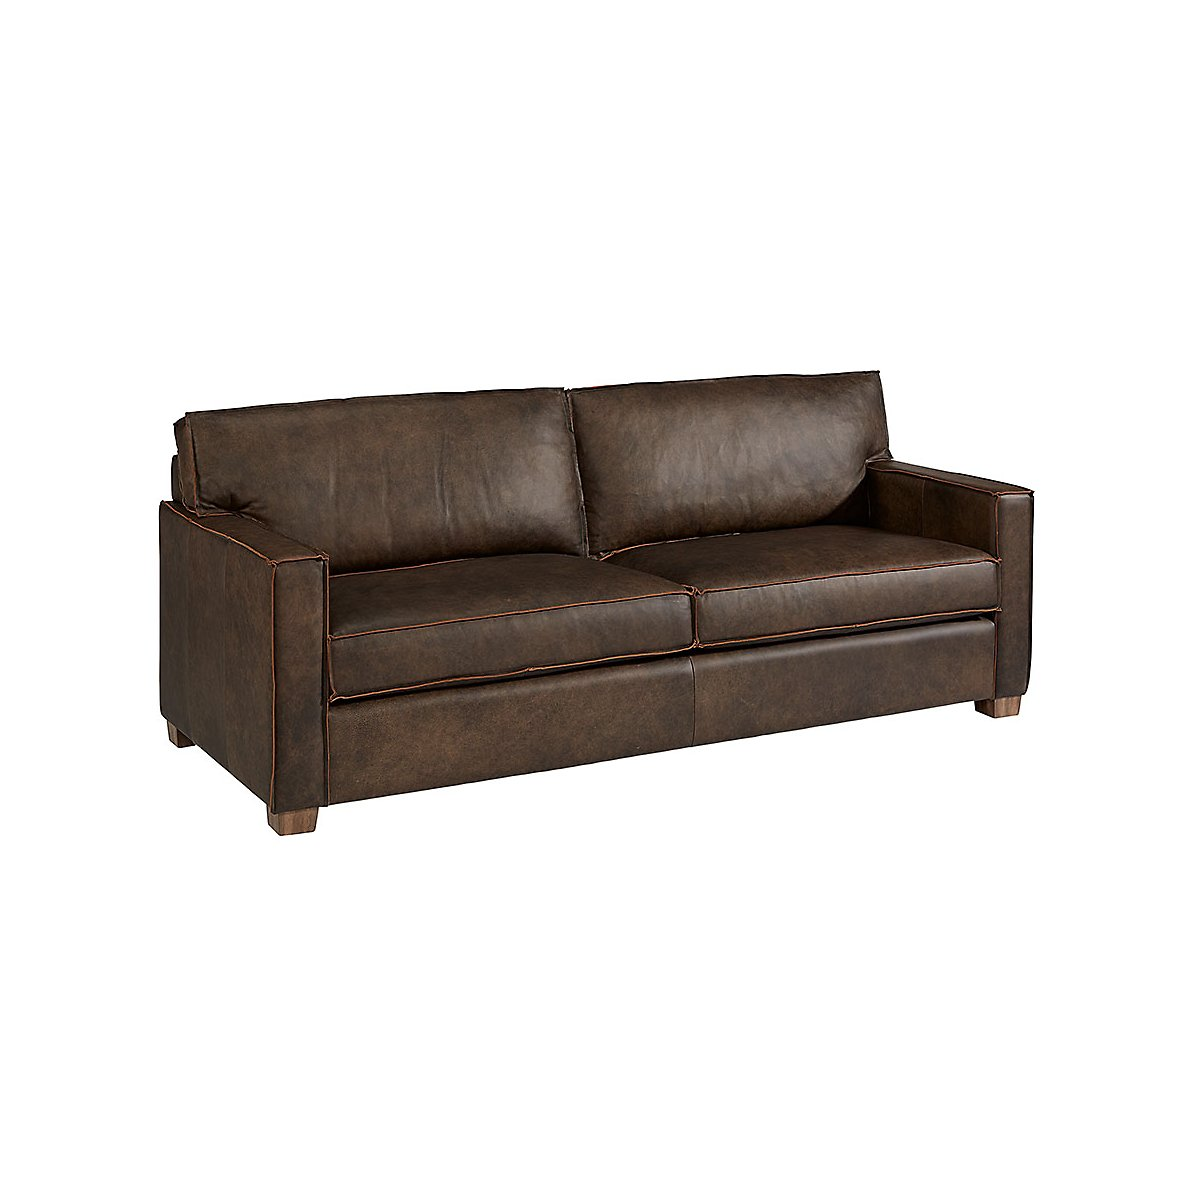 Ravel Dark Brown Leather Sofa